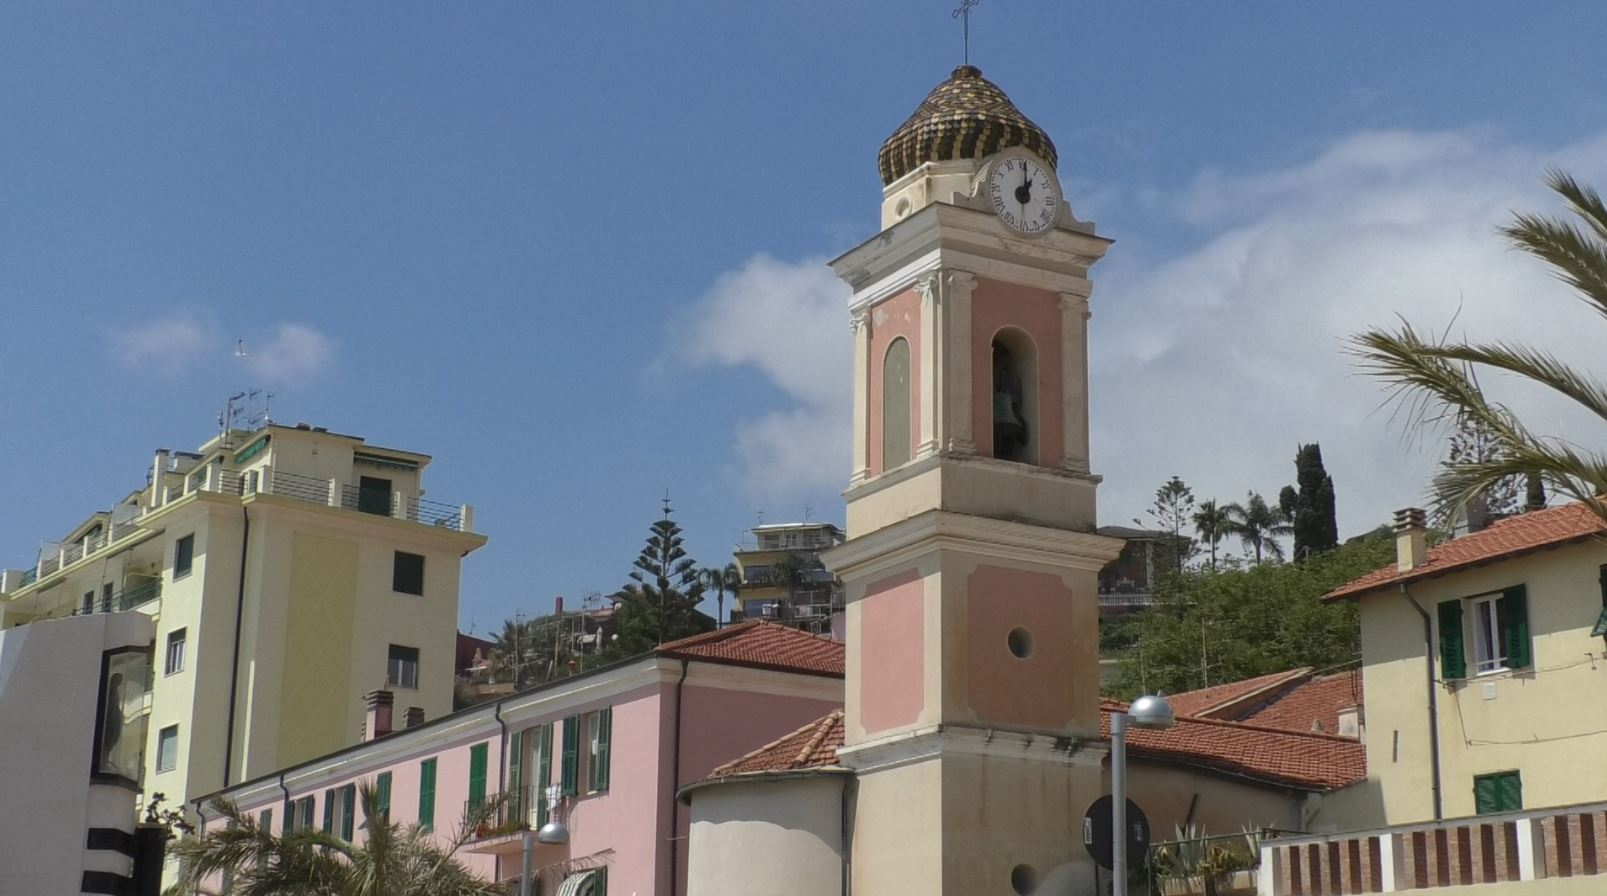 Chiesa di San Giuseppe - Arma di Taggia